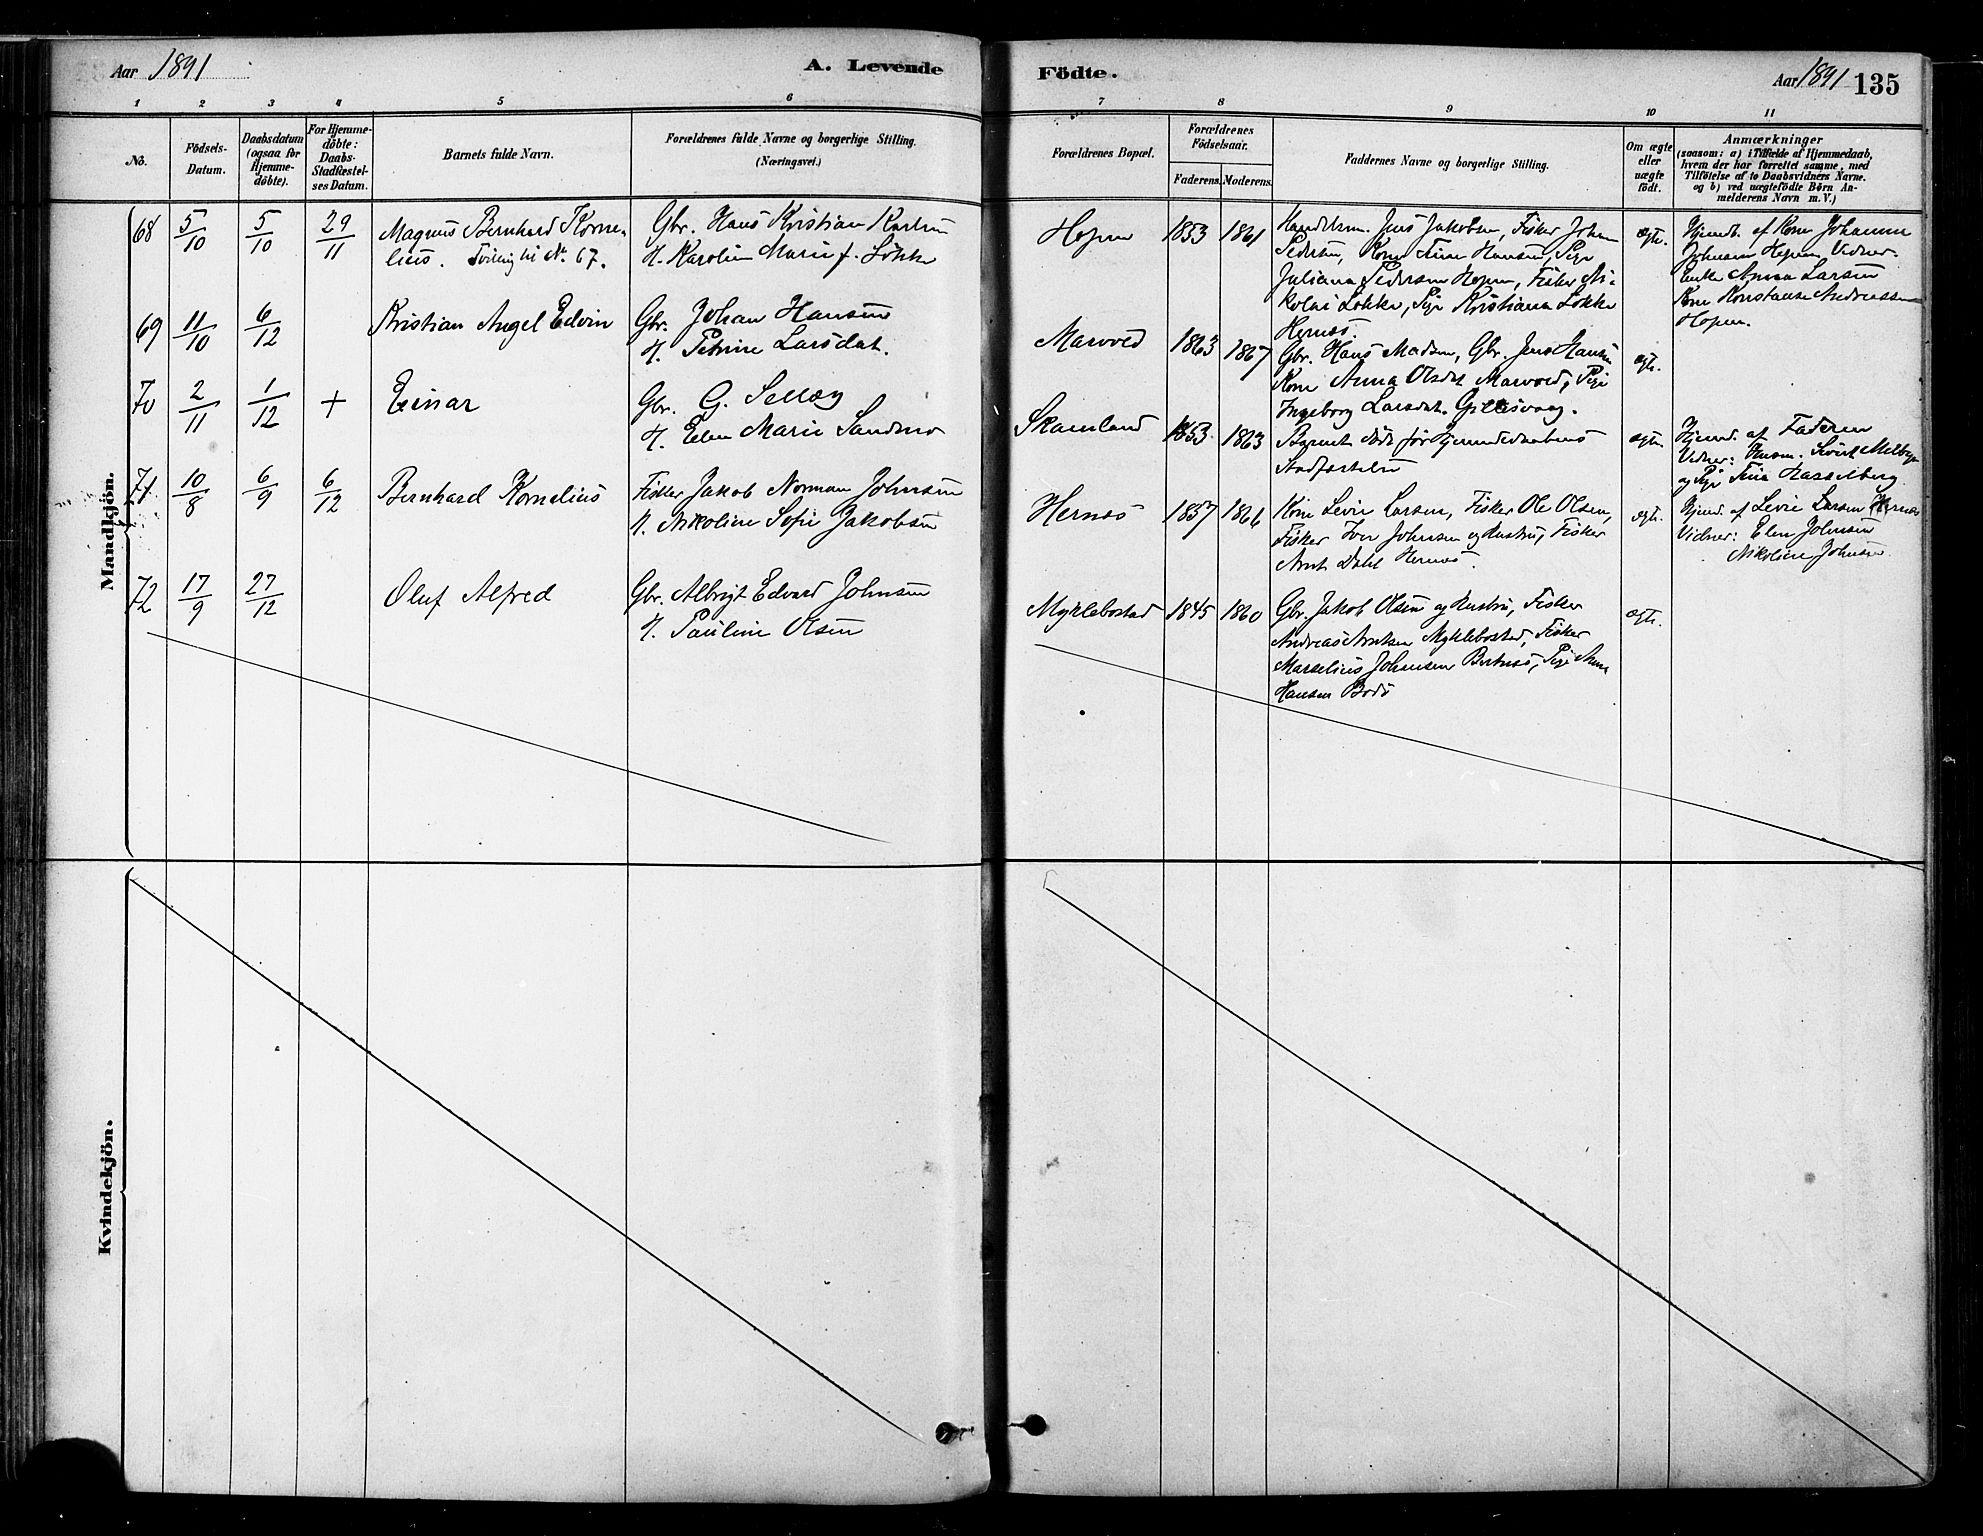 SAT, Ministerialprotokoller, klokkerbøker og fødselsregistre - Nordland, 802/L0054: Ministerialbok nr. 802A01, 1879-1893, s. 135